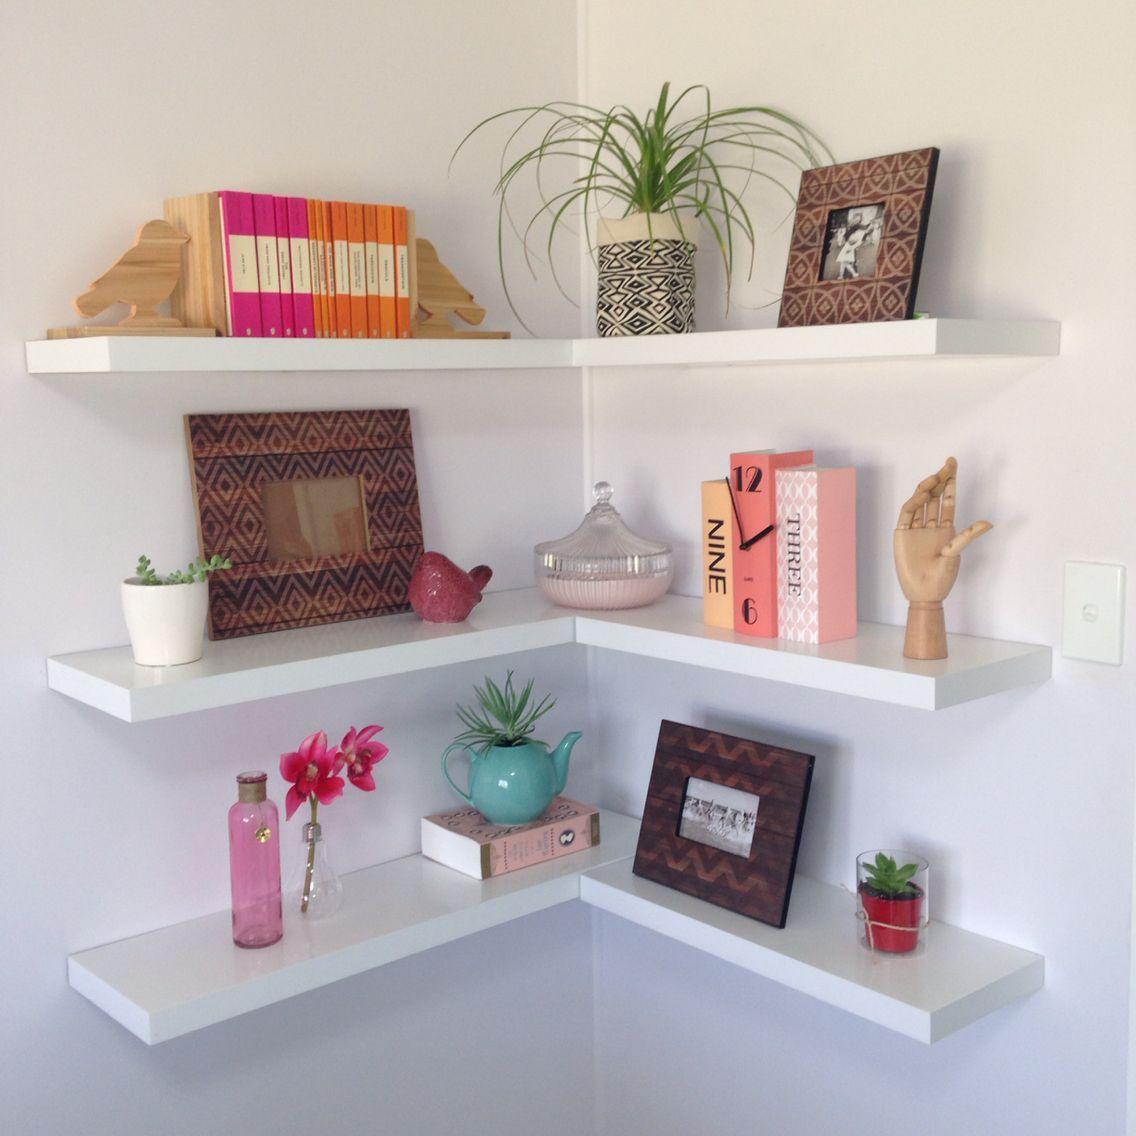 4 Stupendous Diy Ideas: Long Floating Shelves Kitchen